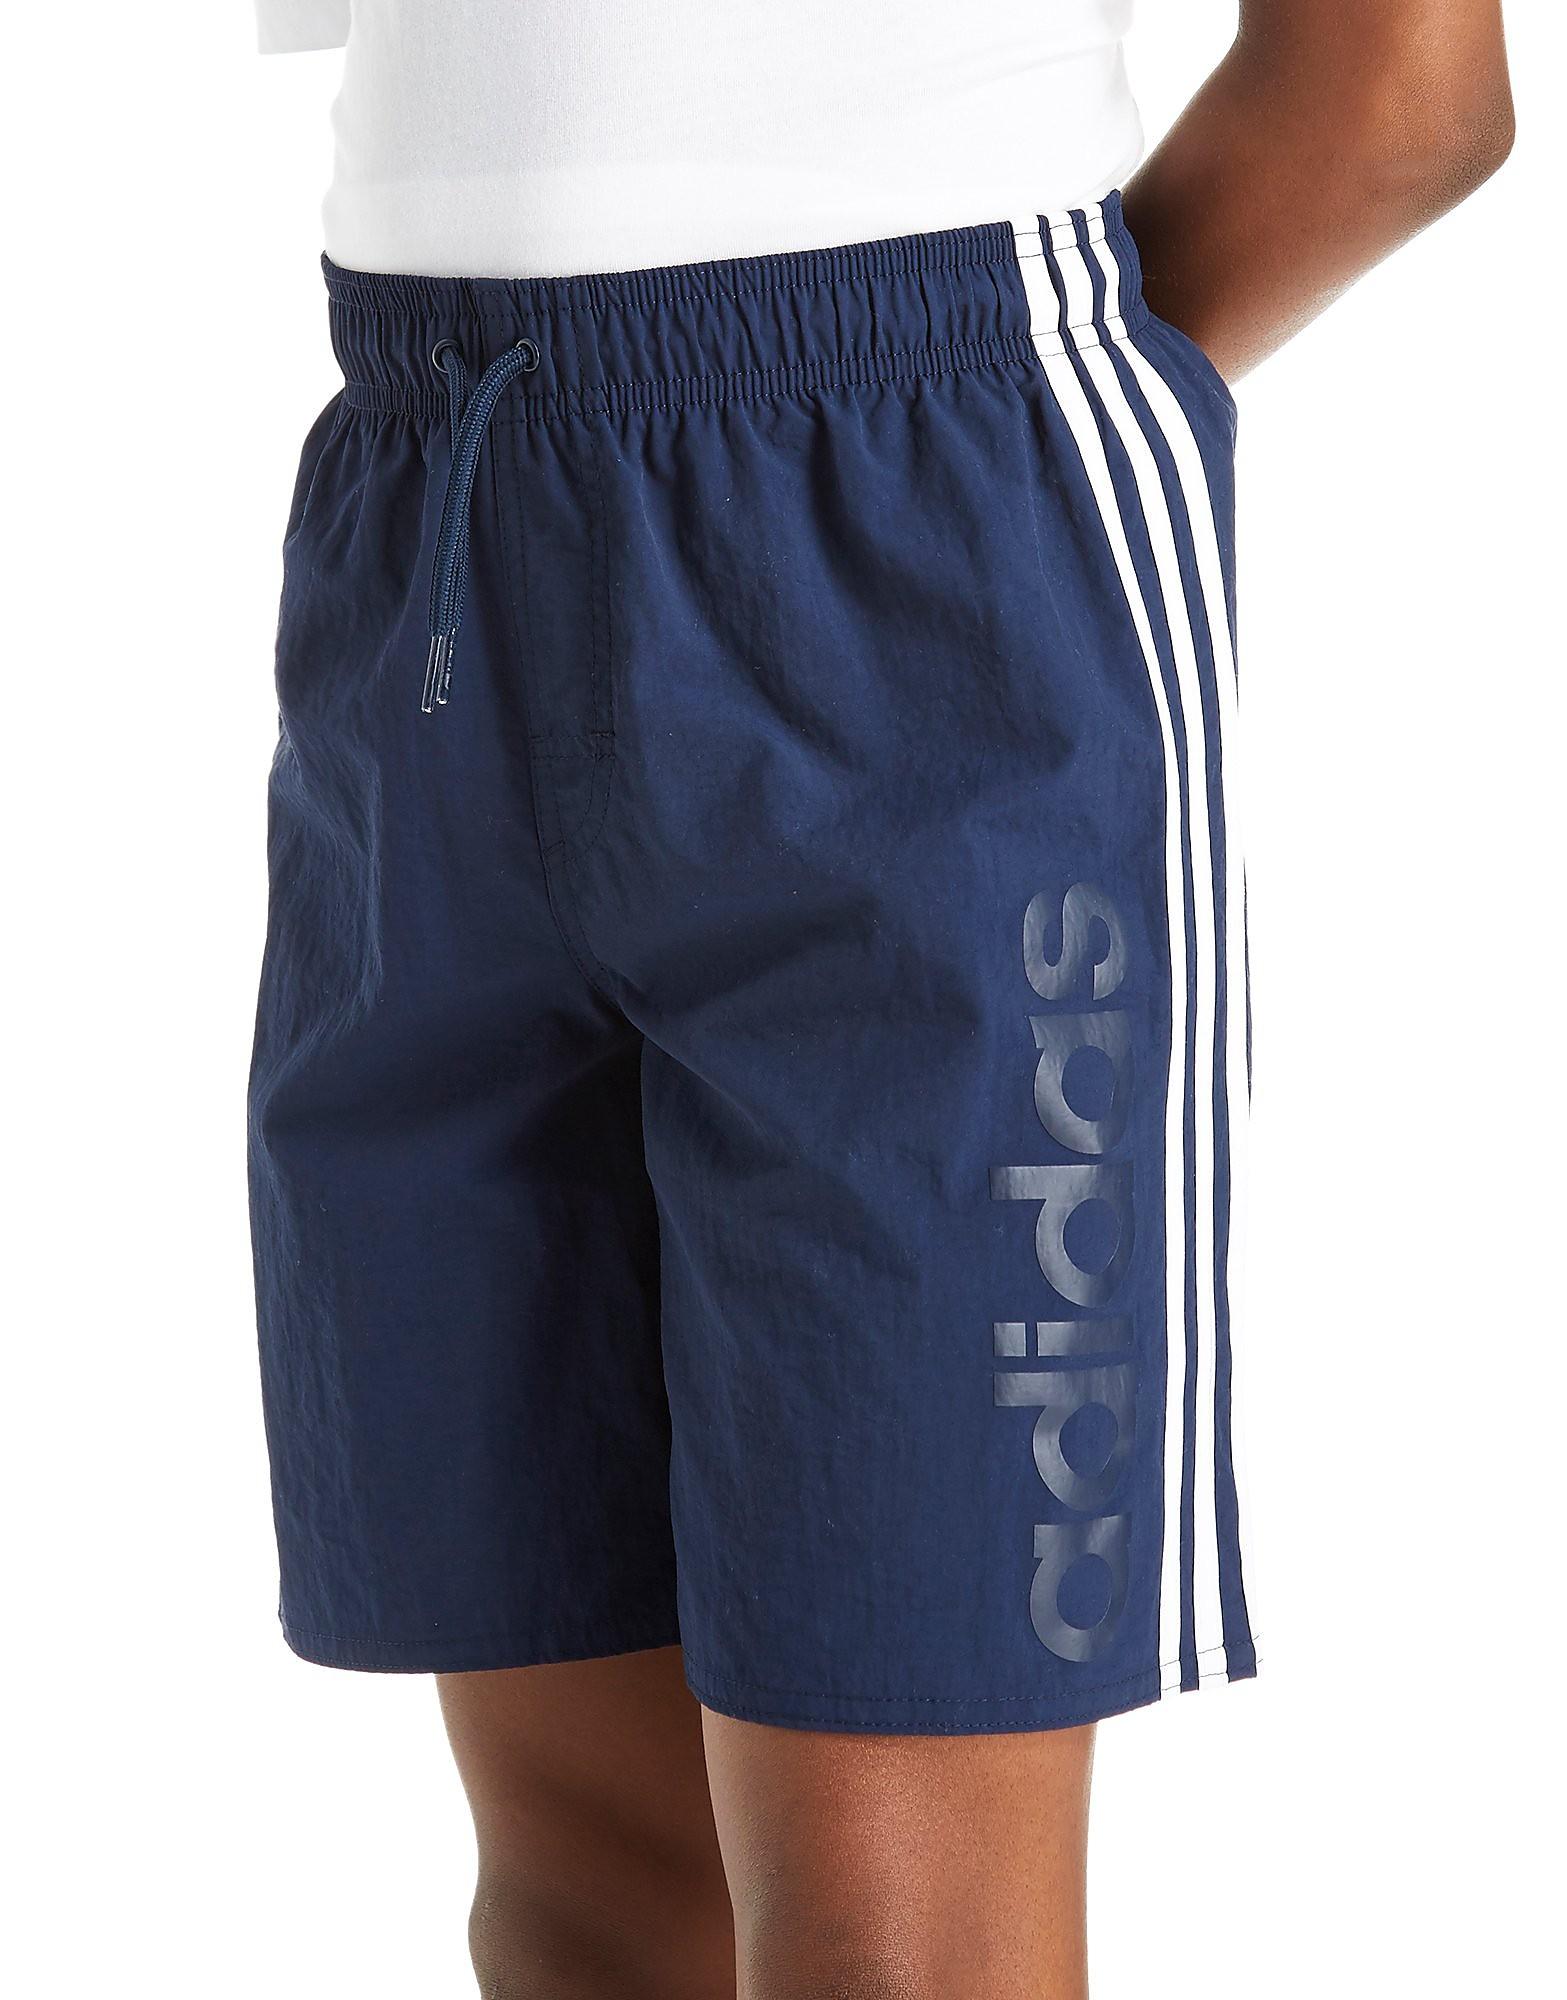 adidas Short de bain Linear junior - Navy/White, Navy/White